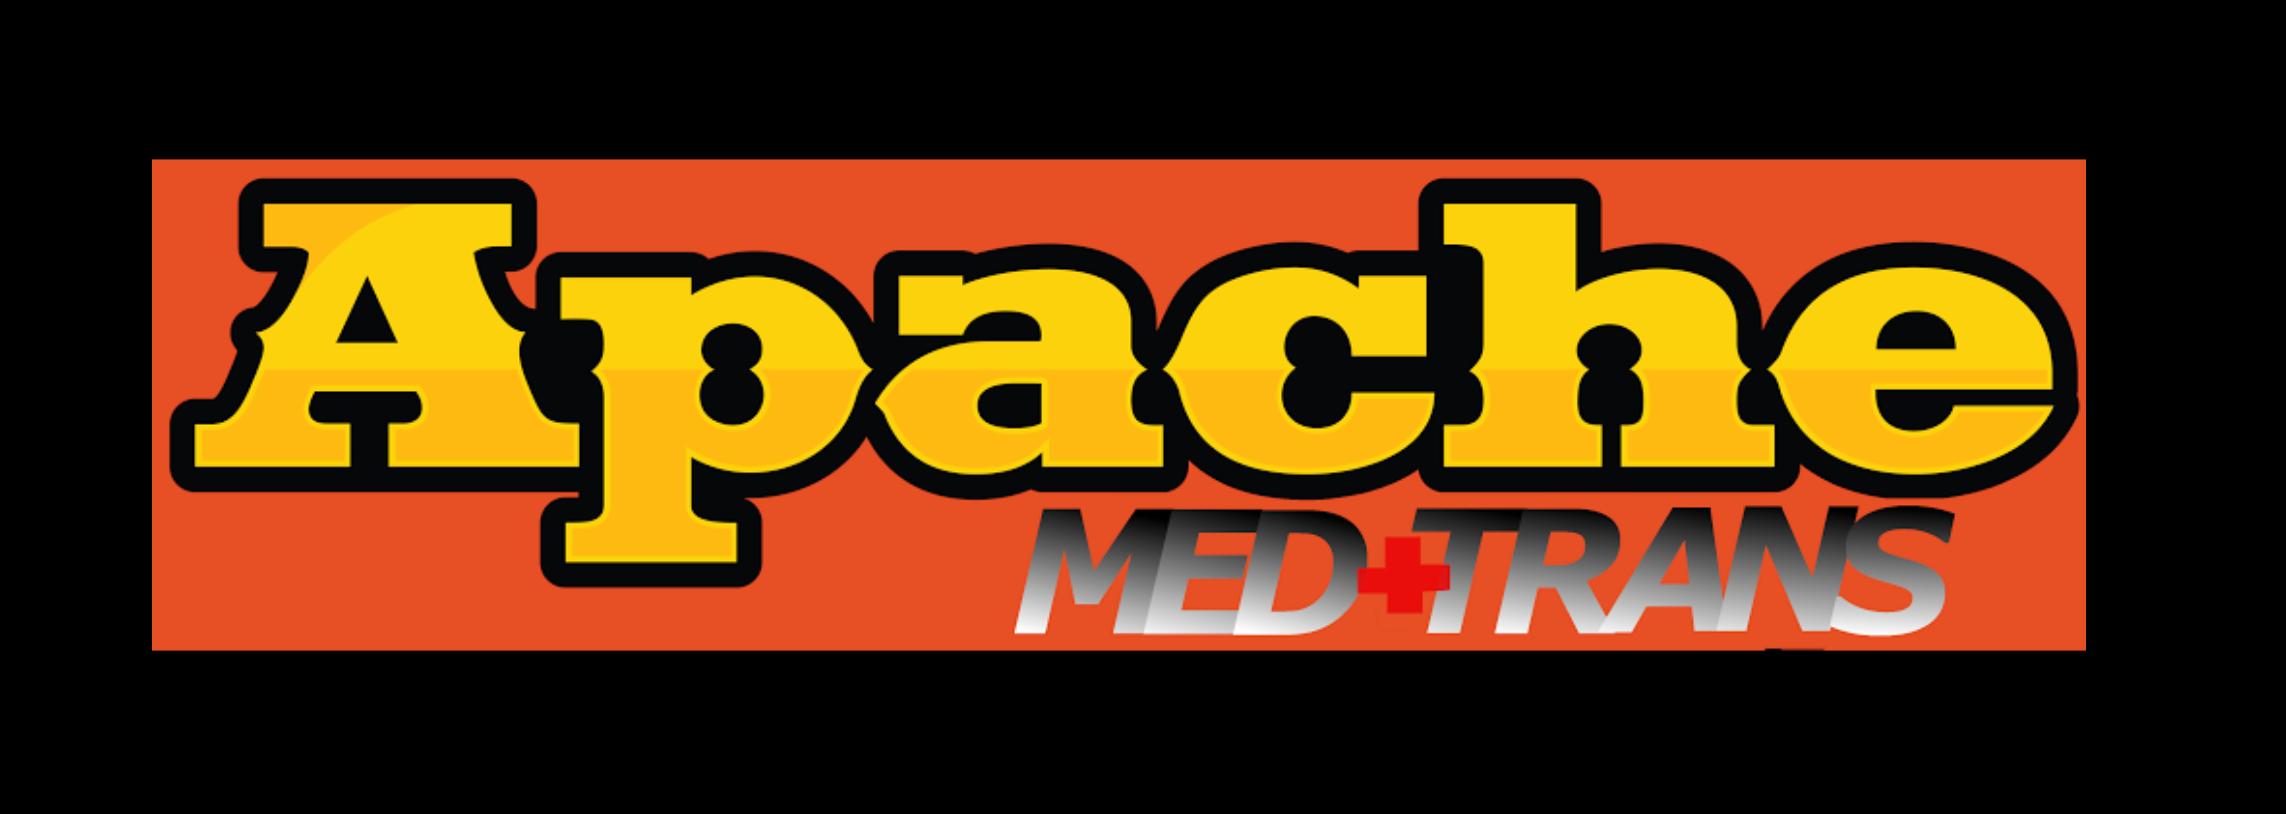 Apache Med Trans (DCS and AHCCCS Transportation Provider)